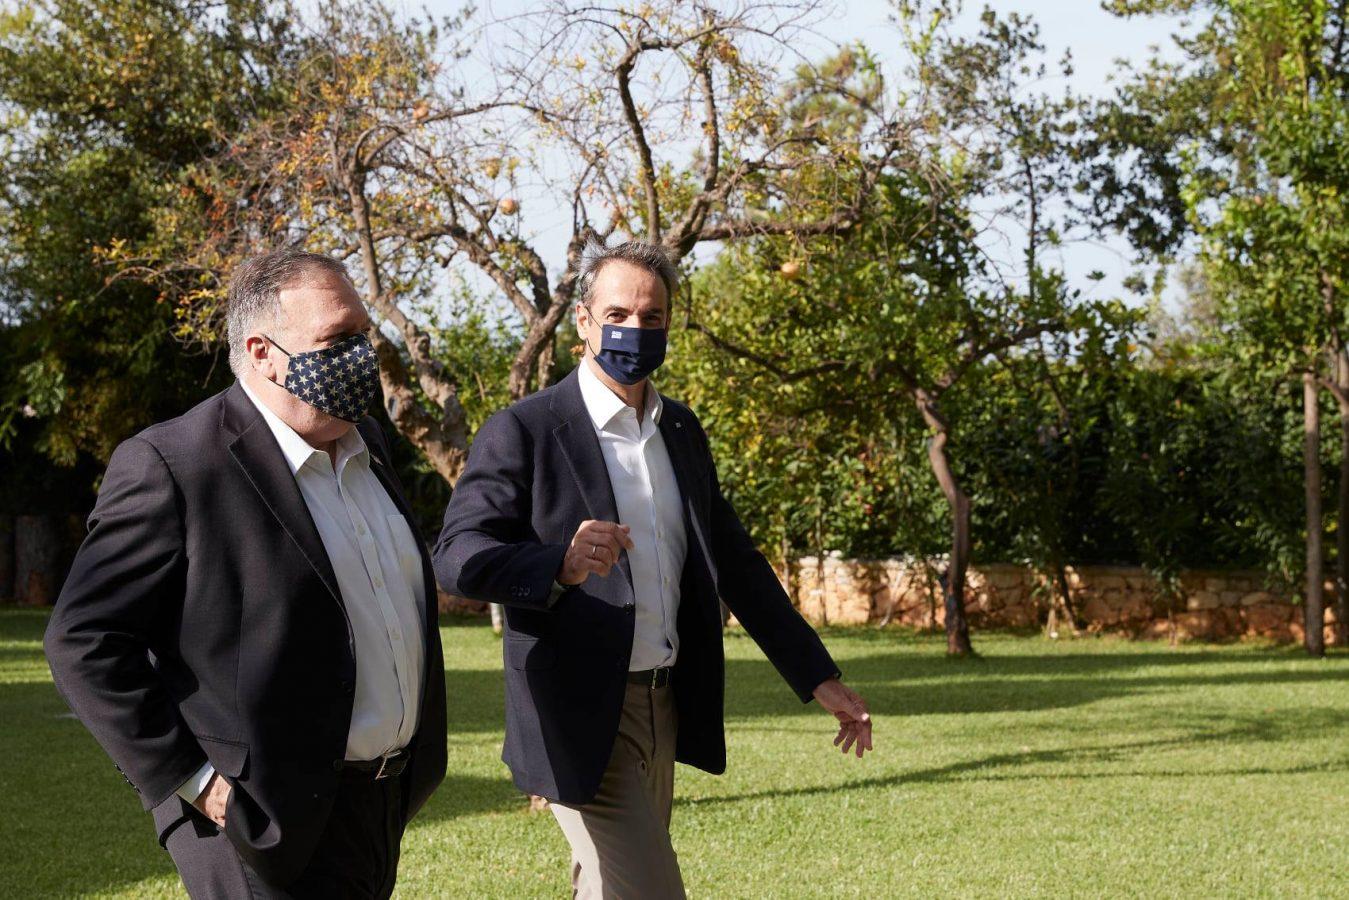 U.S. Secretary of State Mike Pompeo and Greece's PM Kyriakos Mitsotakis